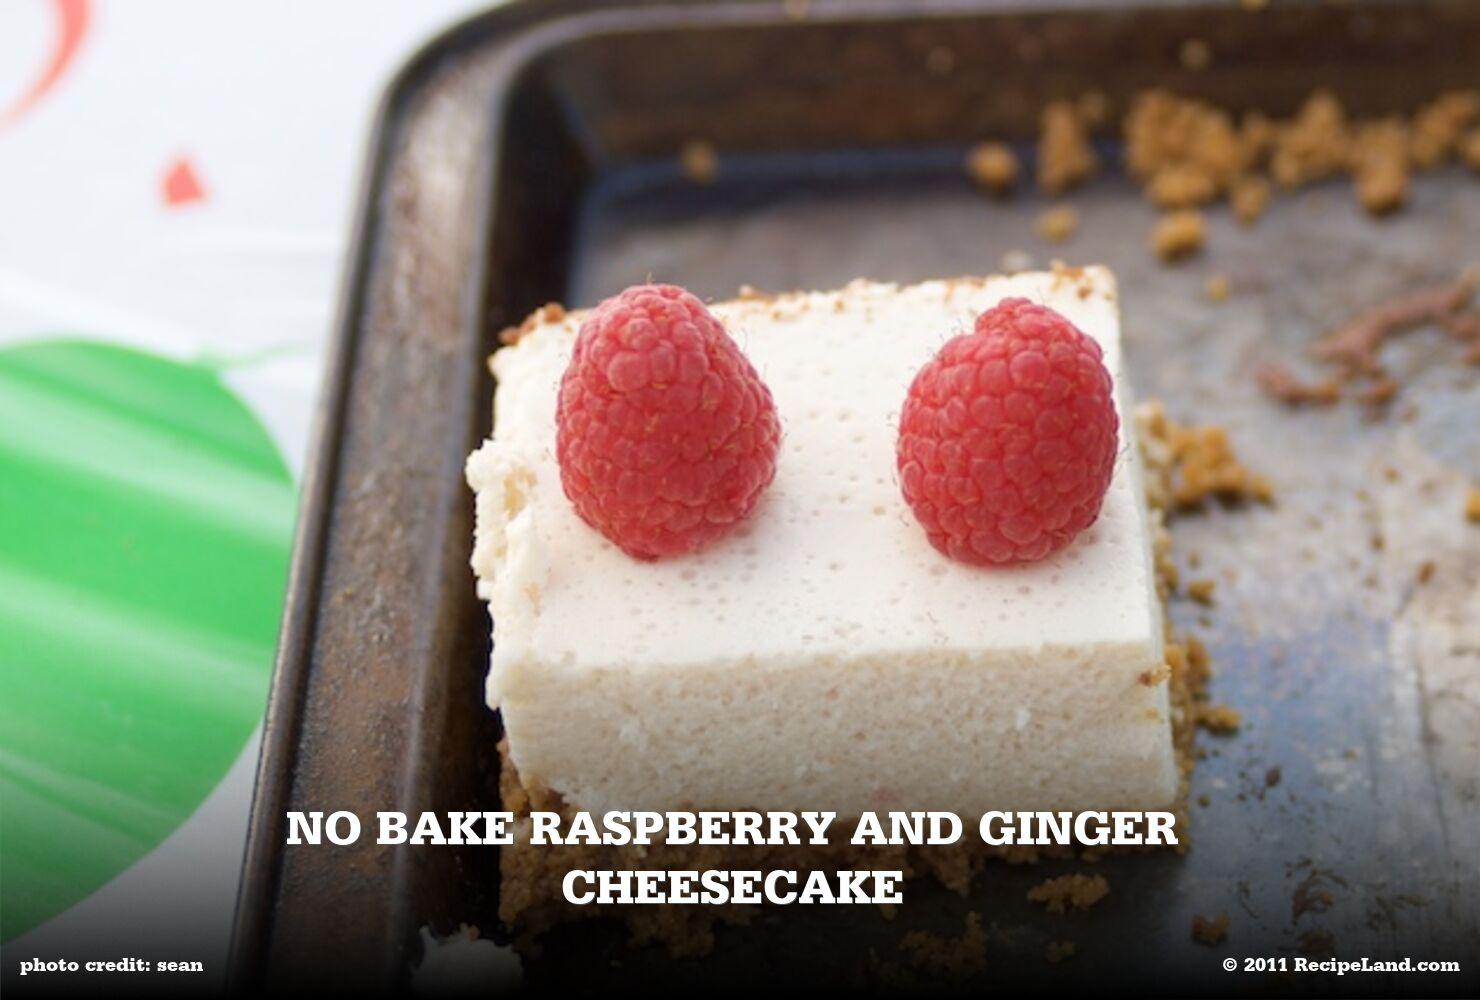 No Bake Raspberry and Ginger Cheesecake